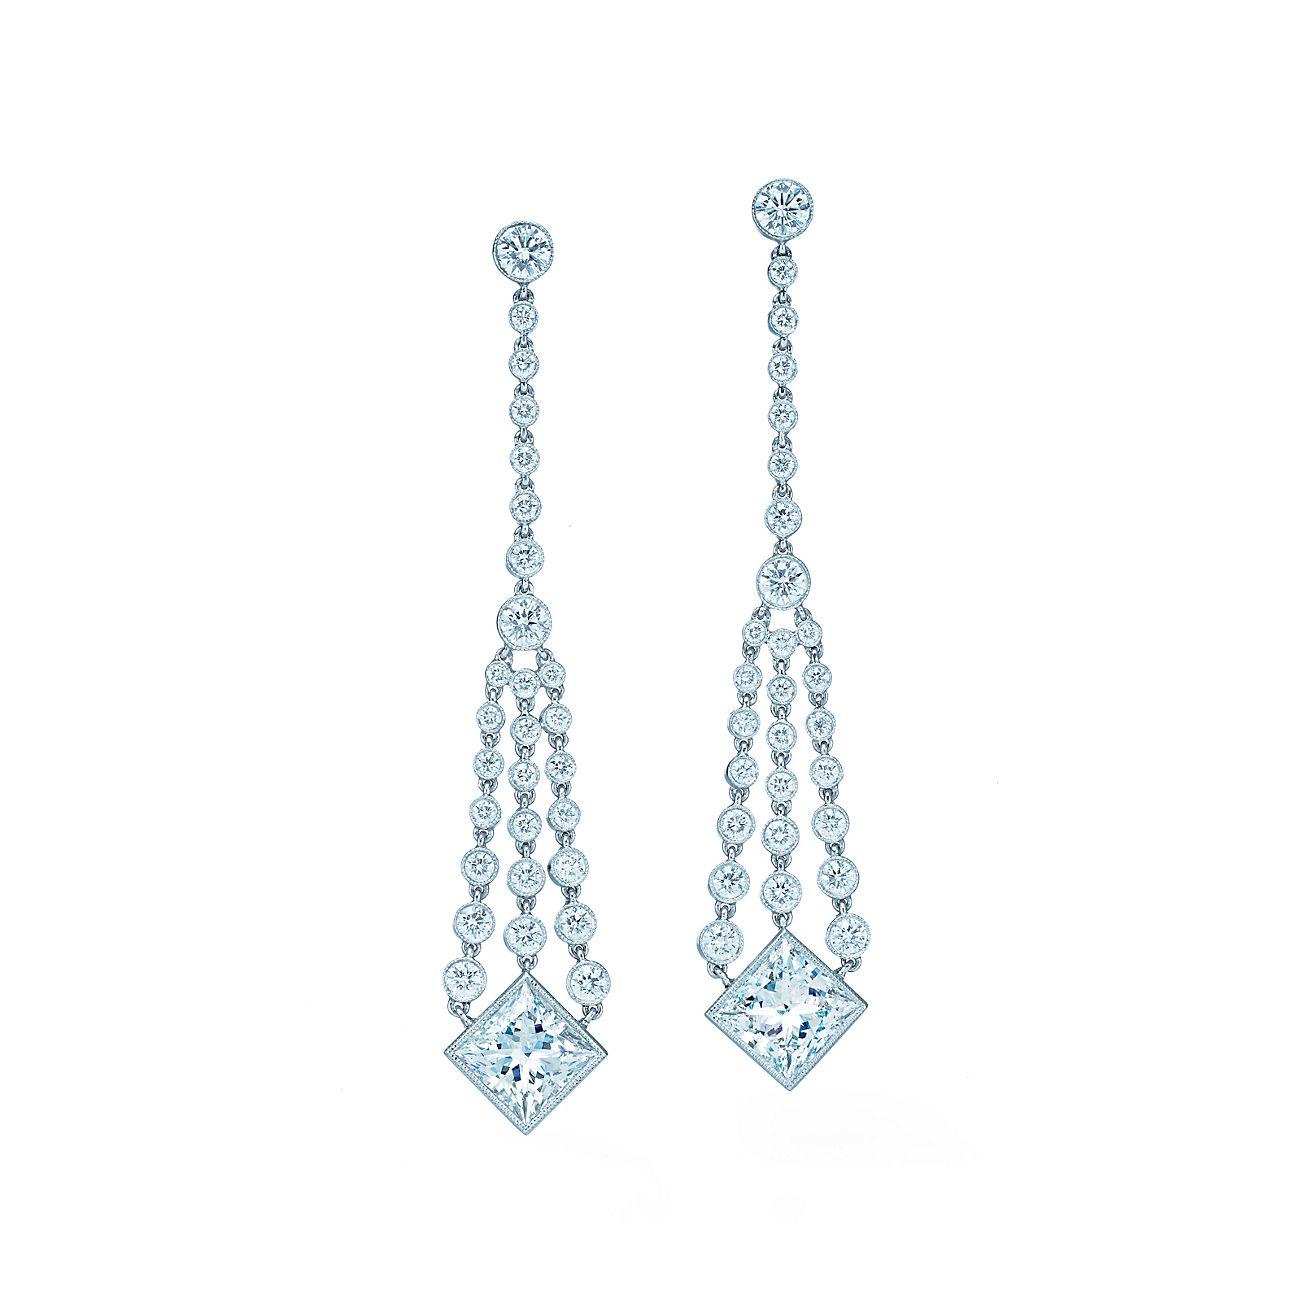 Diamond chandelier earrings of princesscut and round diamonds in – Tiffany Chandelier Earrings